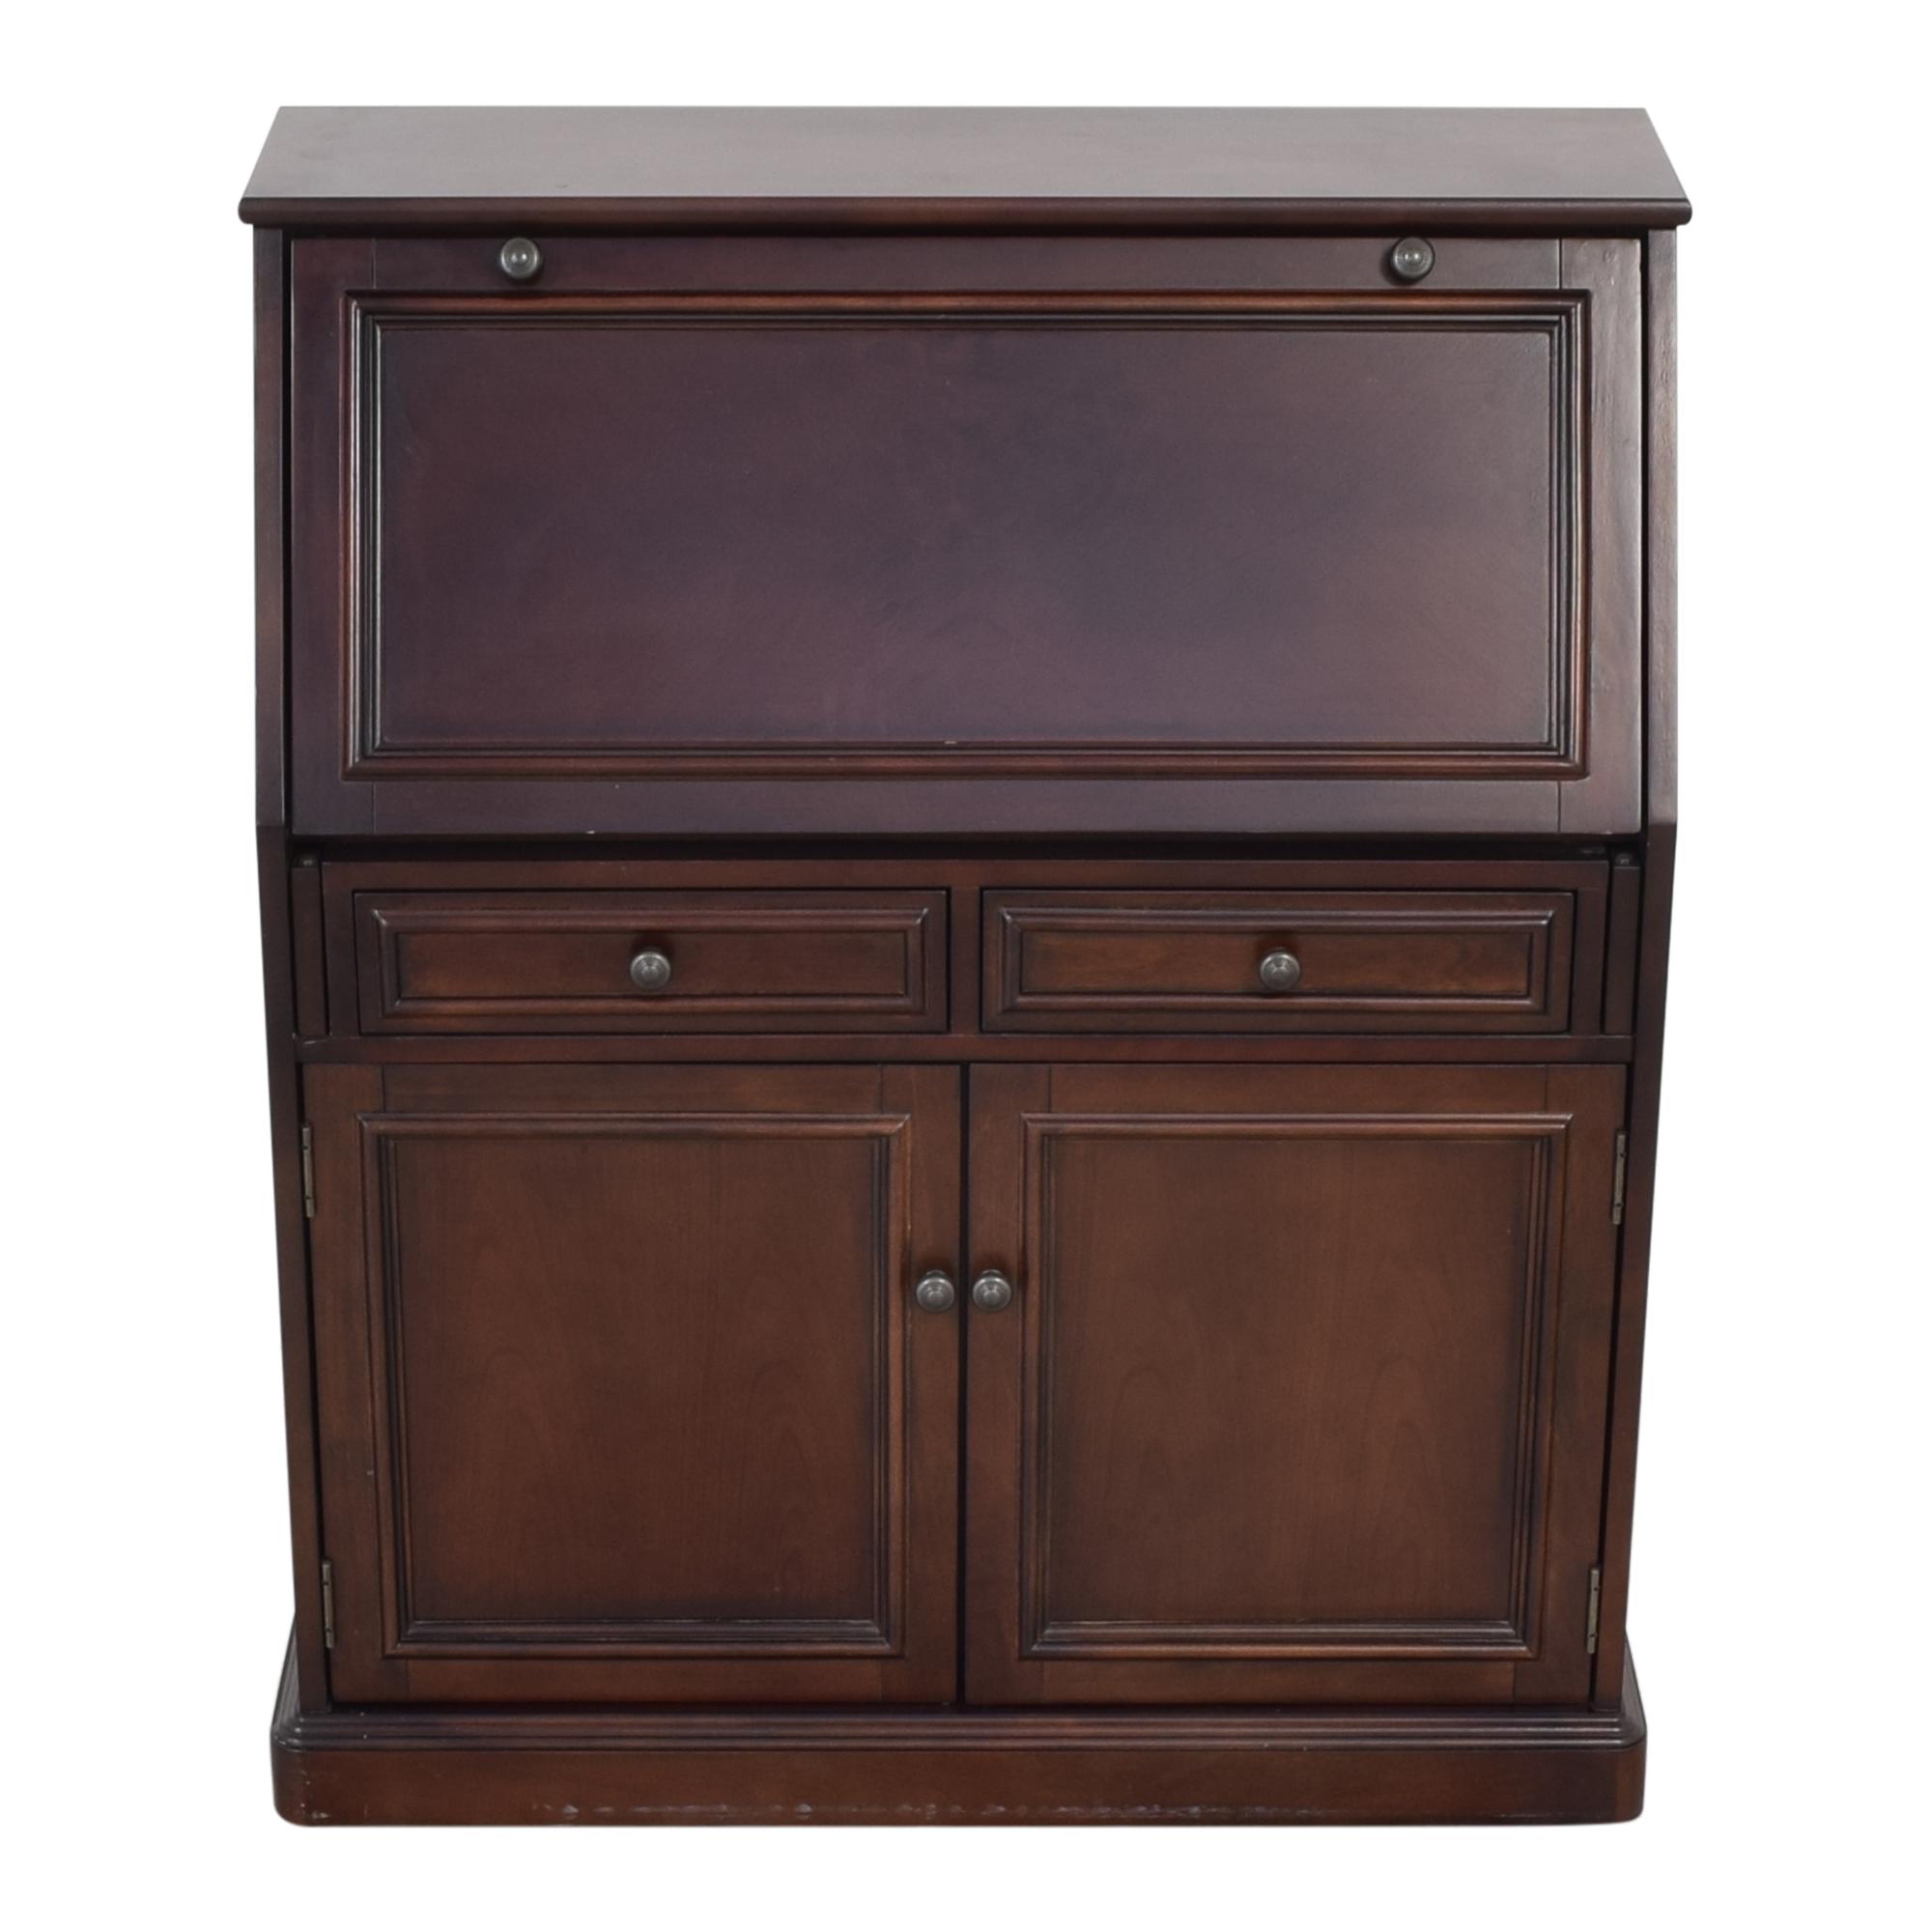 shop Raymour & Flanigan Raymour & Flanigan Jennings Laptop Desk Armoire online